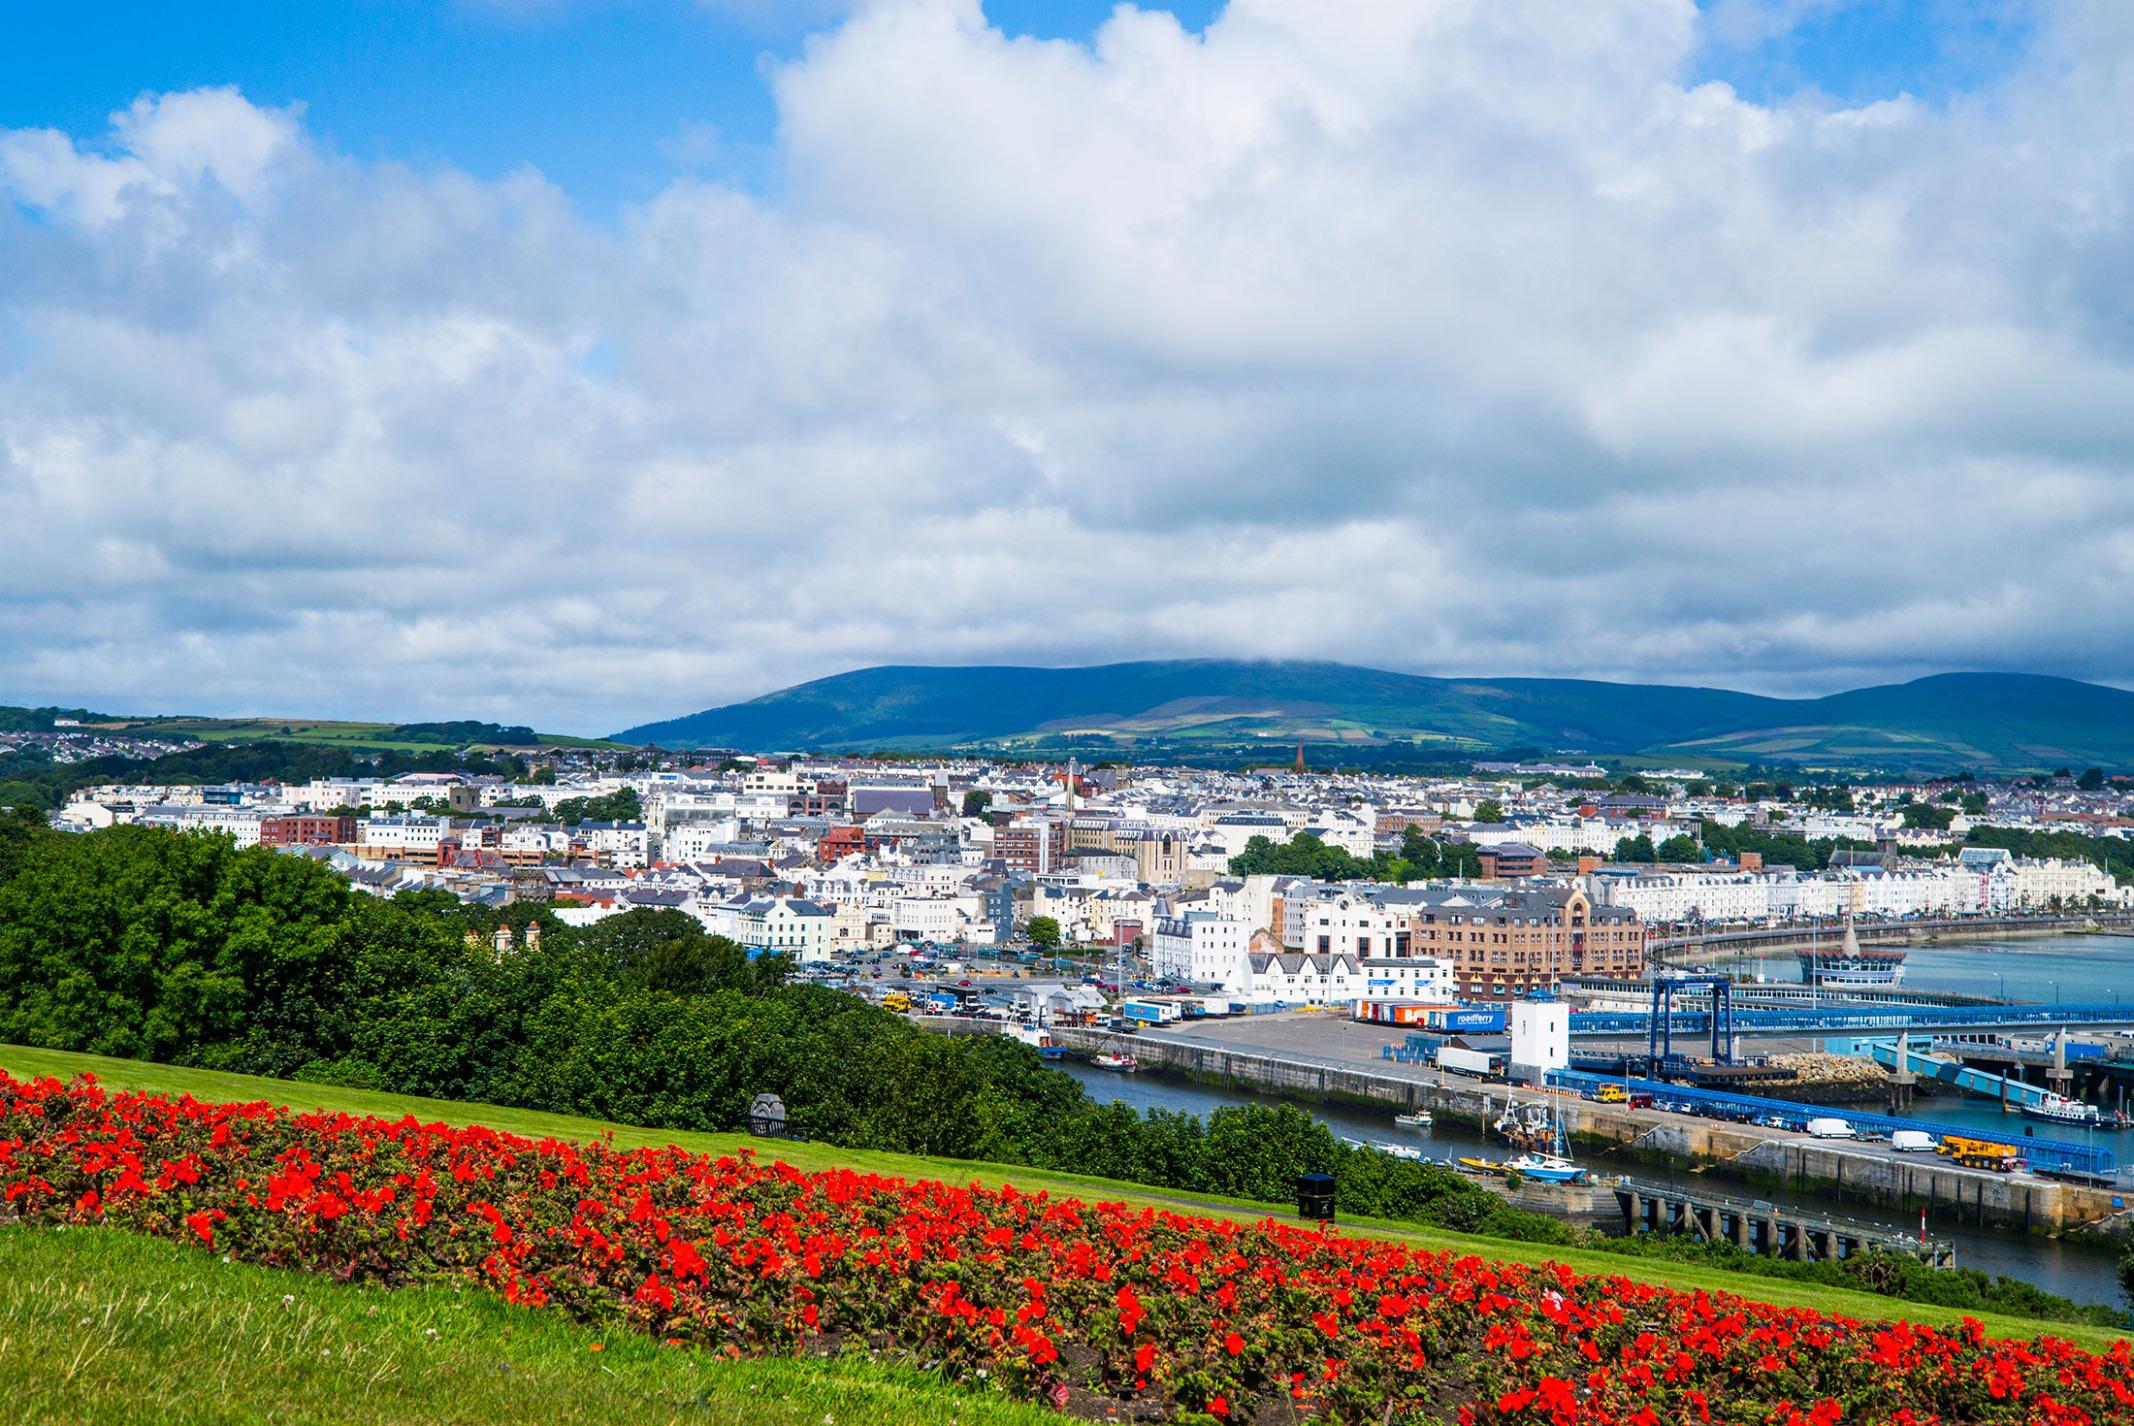 A view of Douglas, the Isle's capital